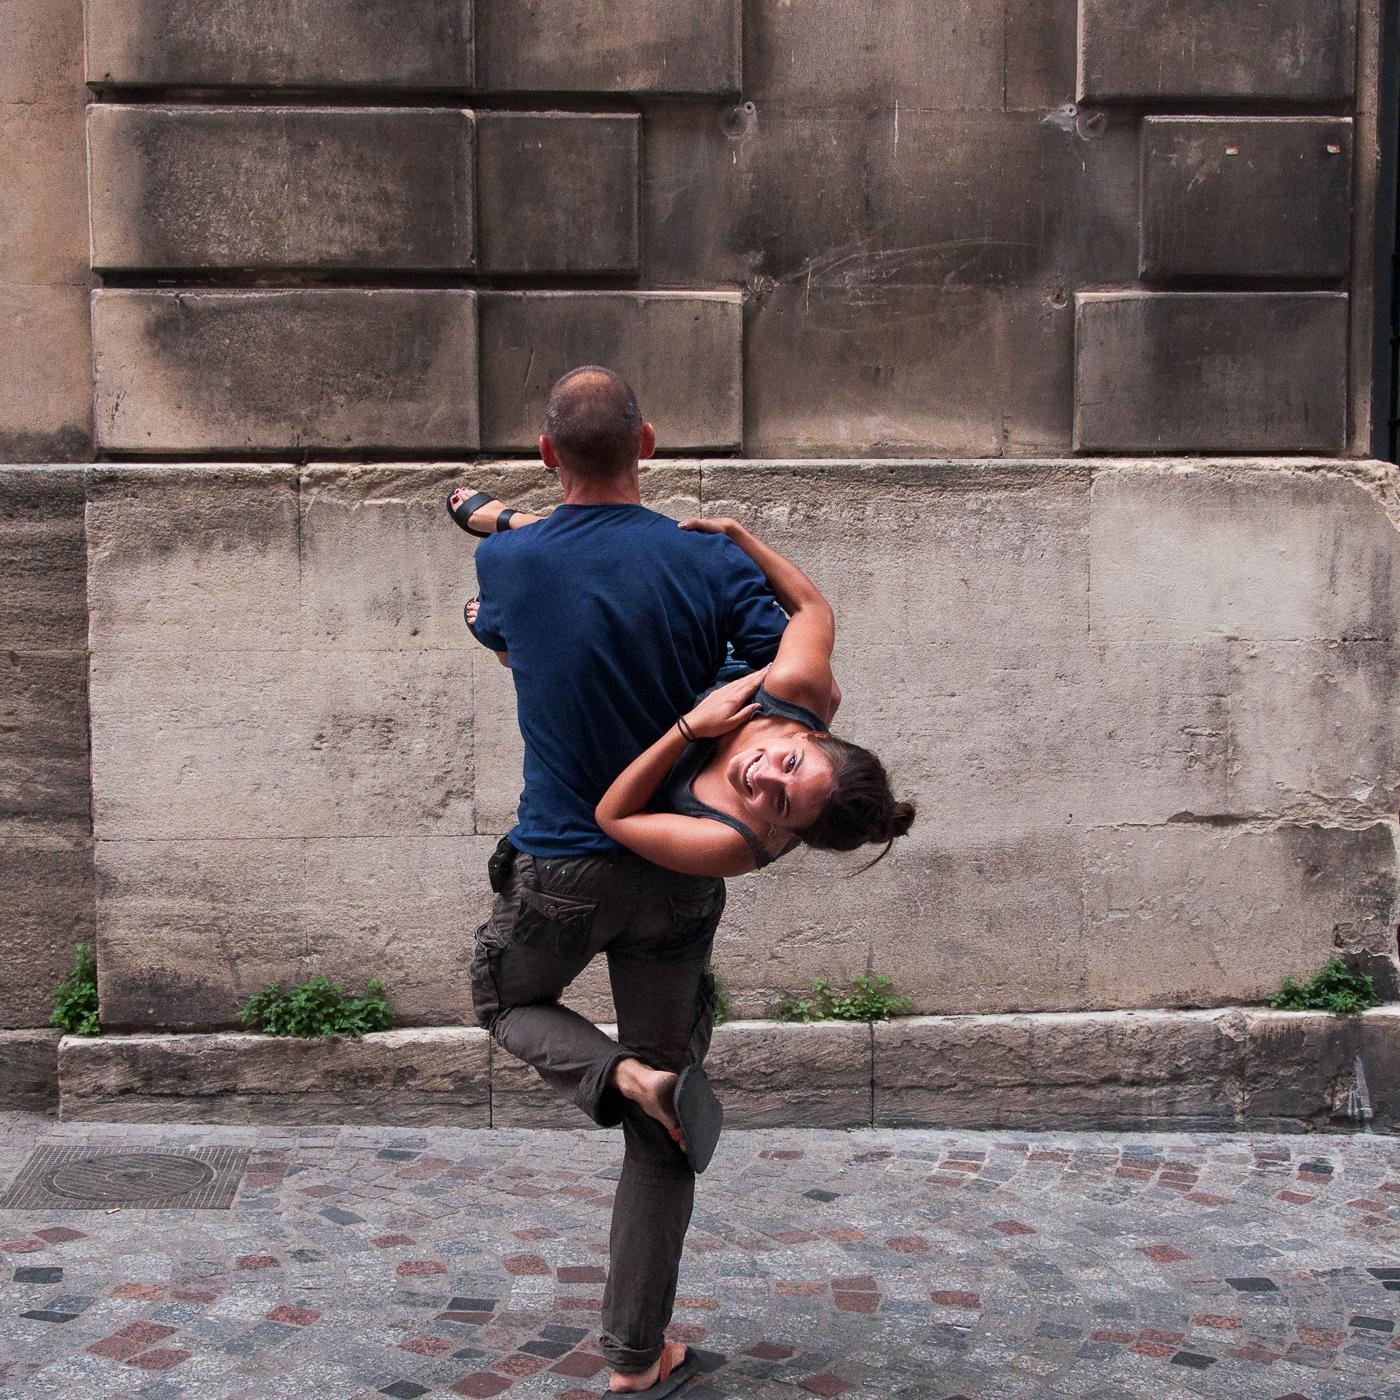 Arles 2015 - Flamant